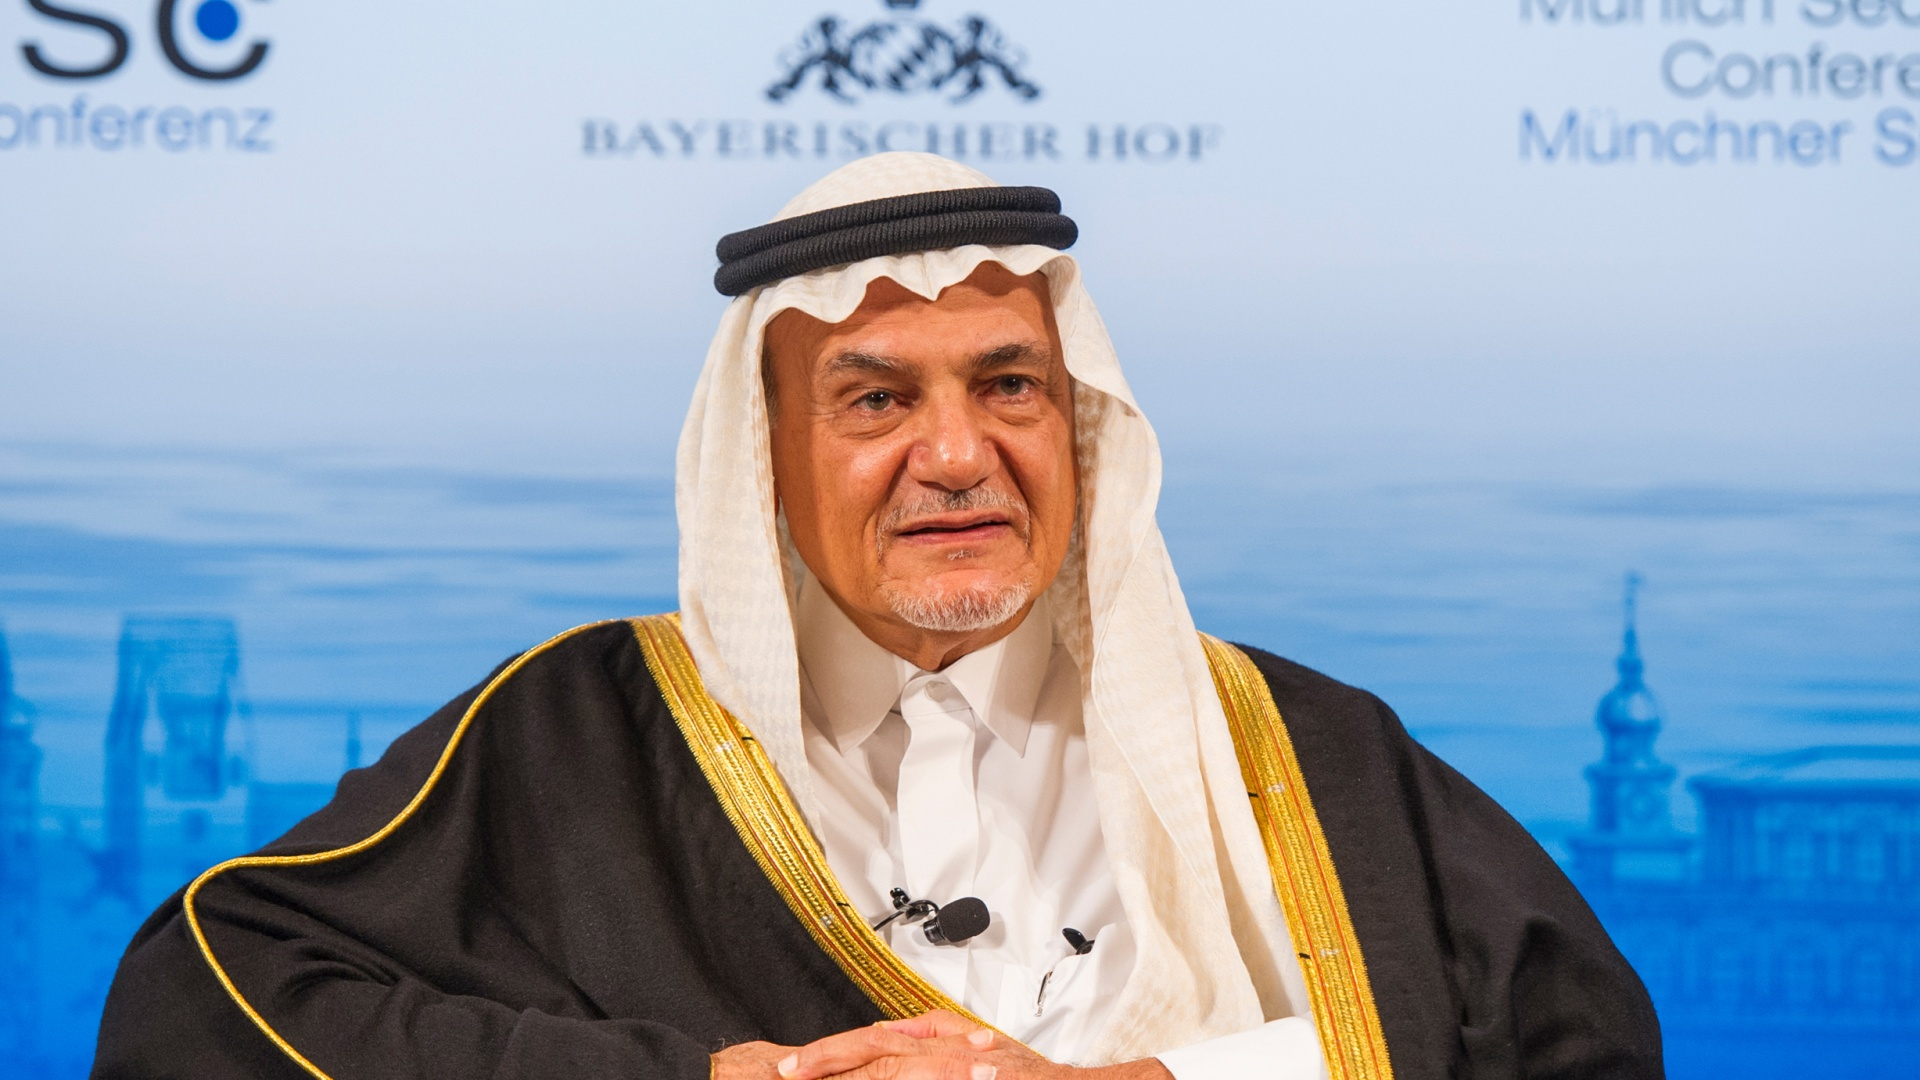 Interview with former Saudi intelligence chief Prince Turki al-Faisal